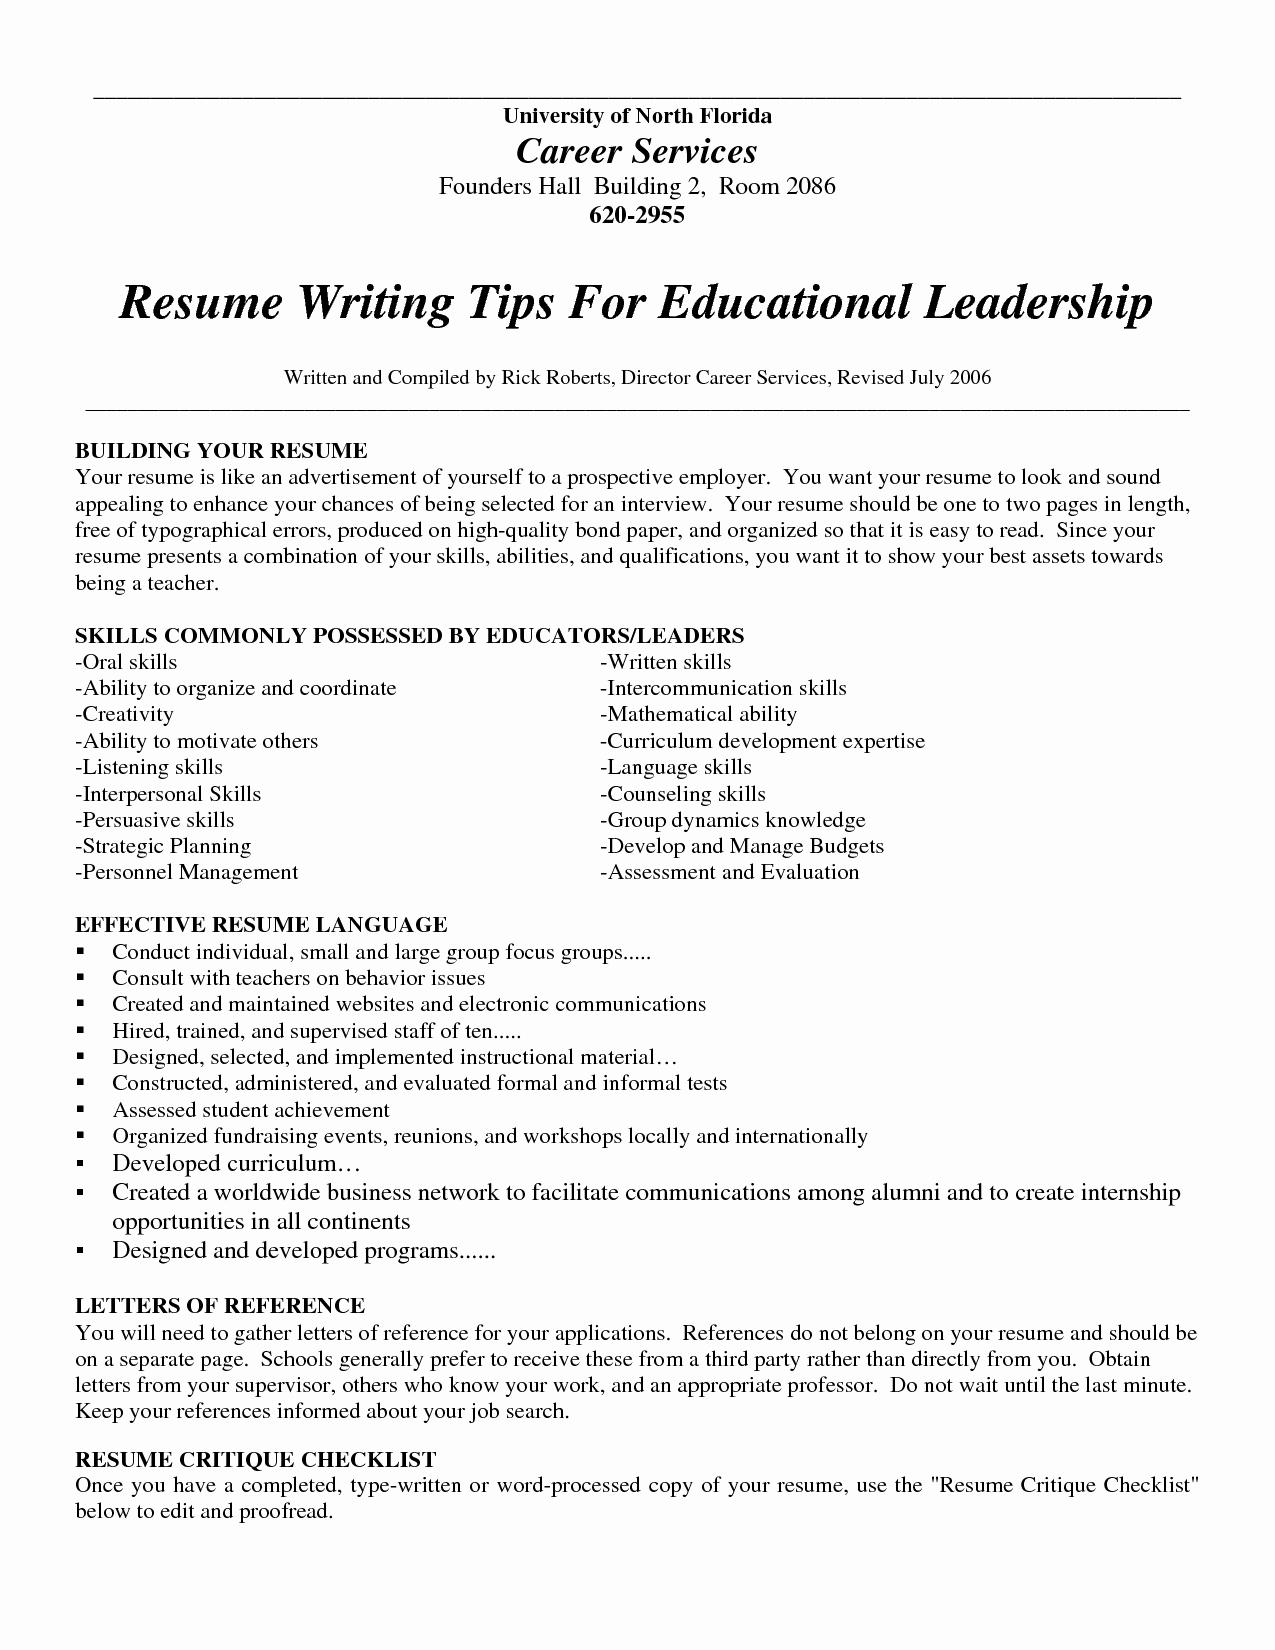 Professional Resume Tips